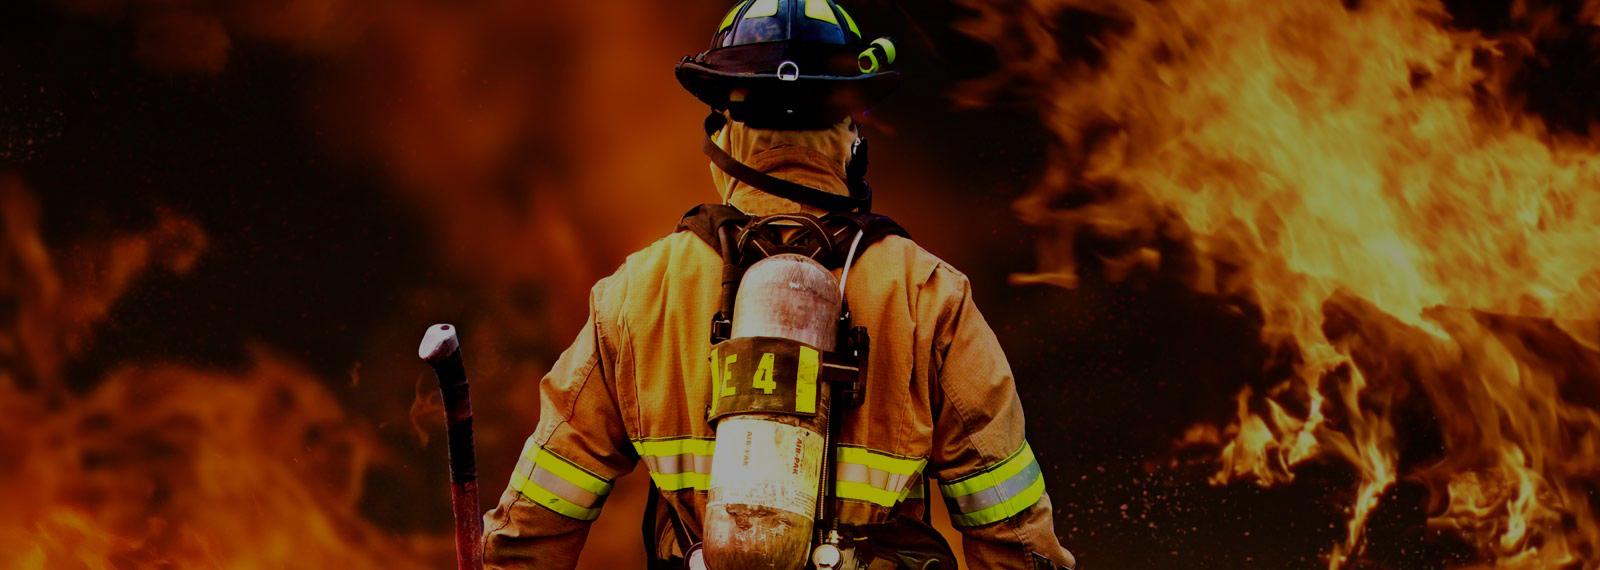 Fireman-1600x570